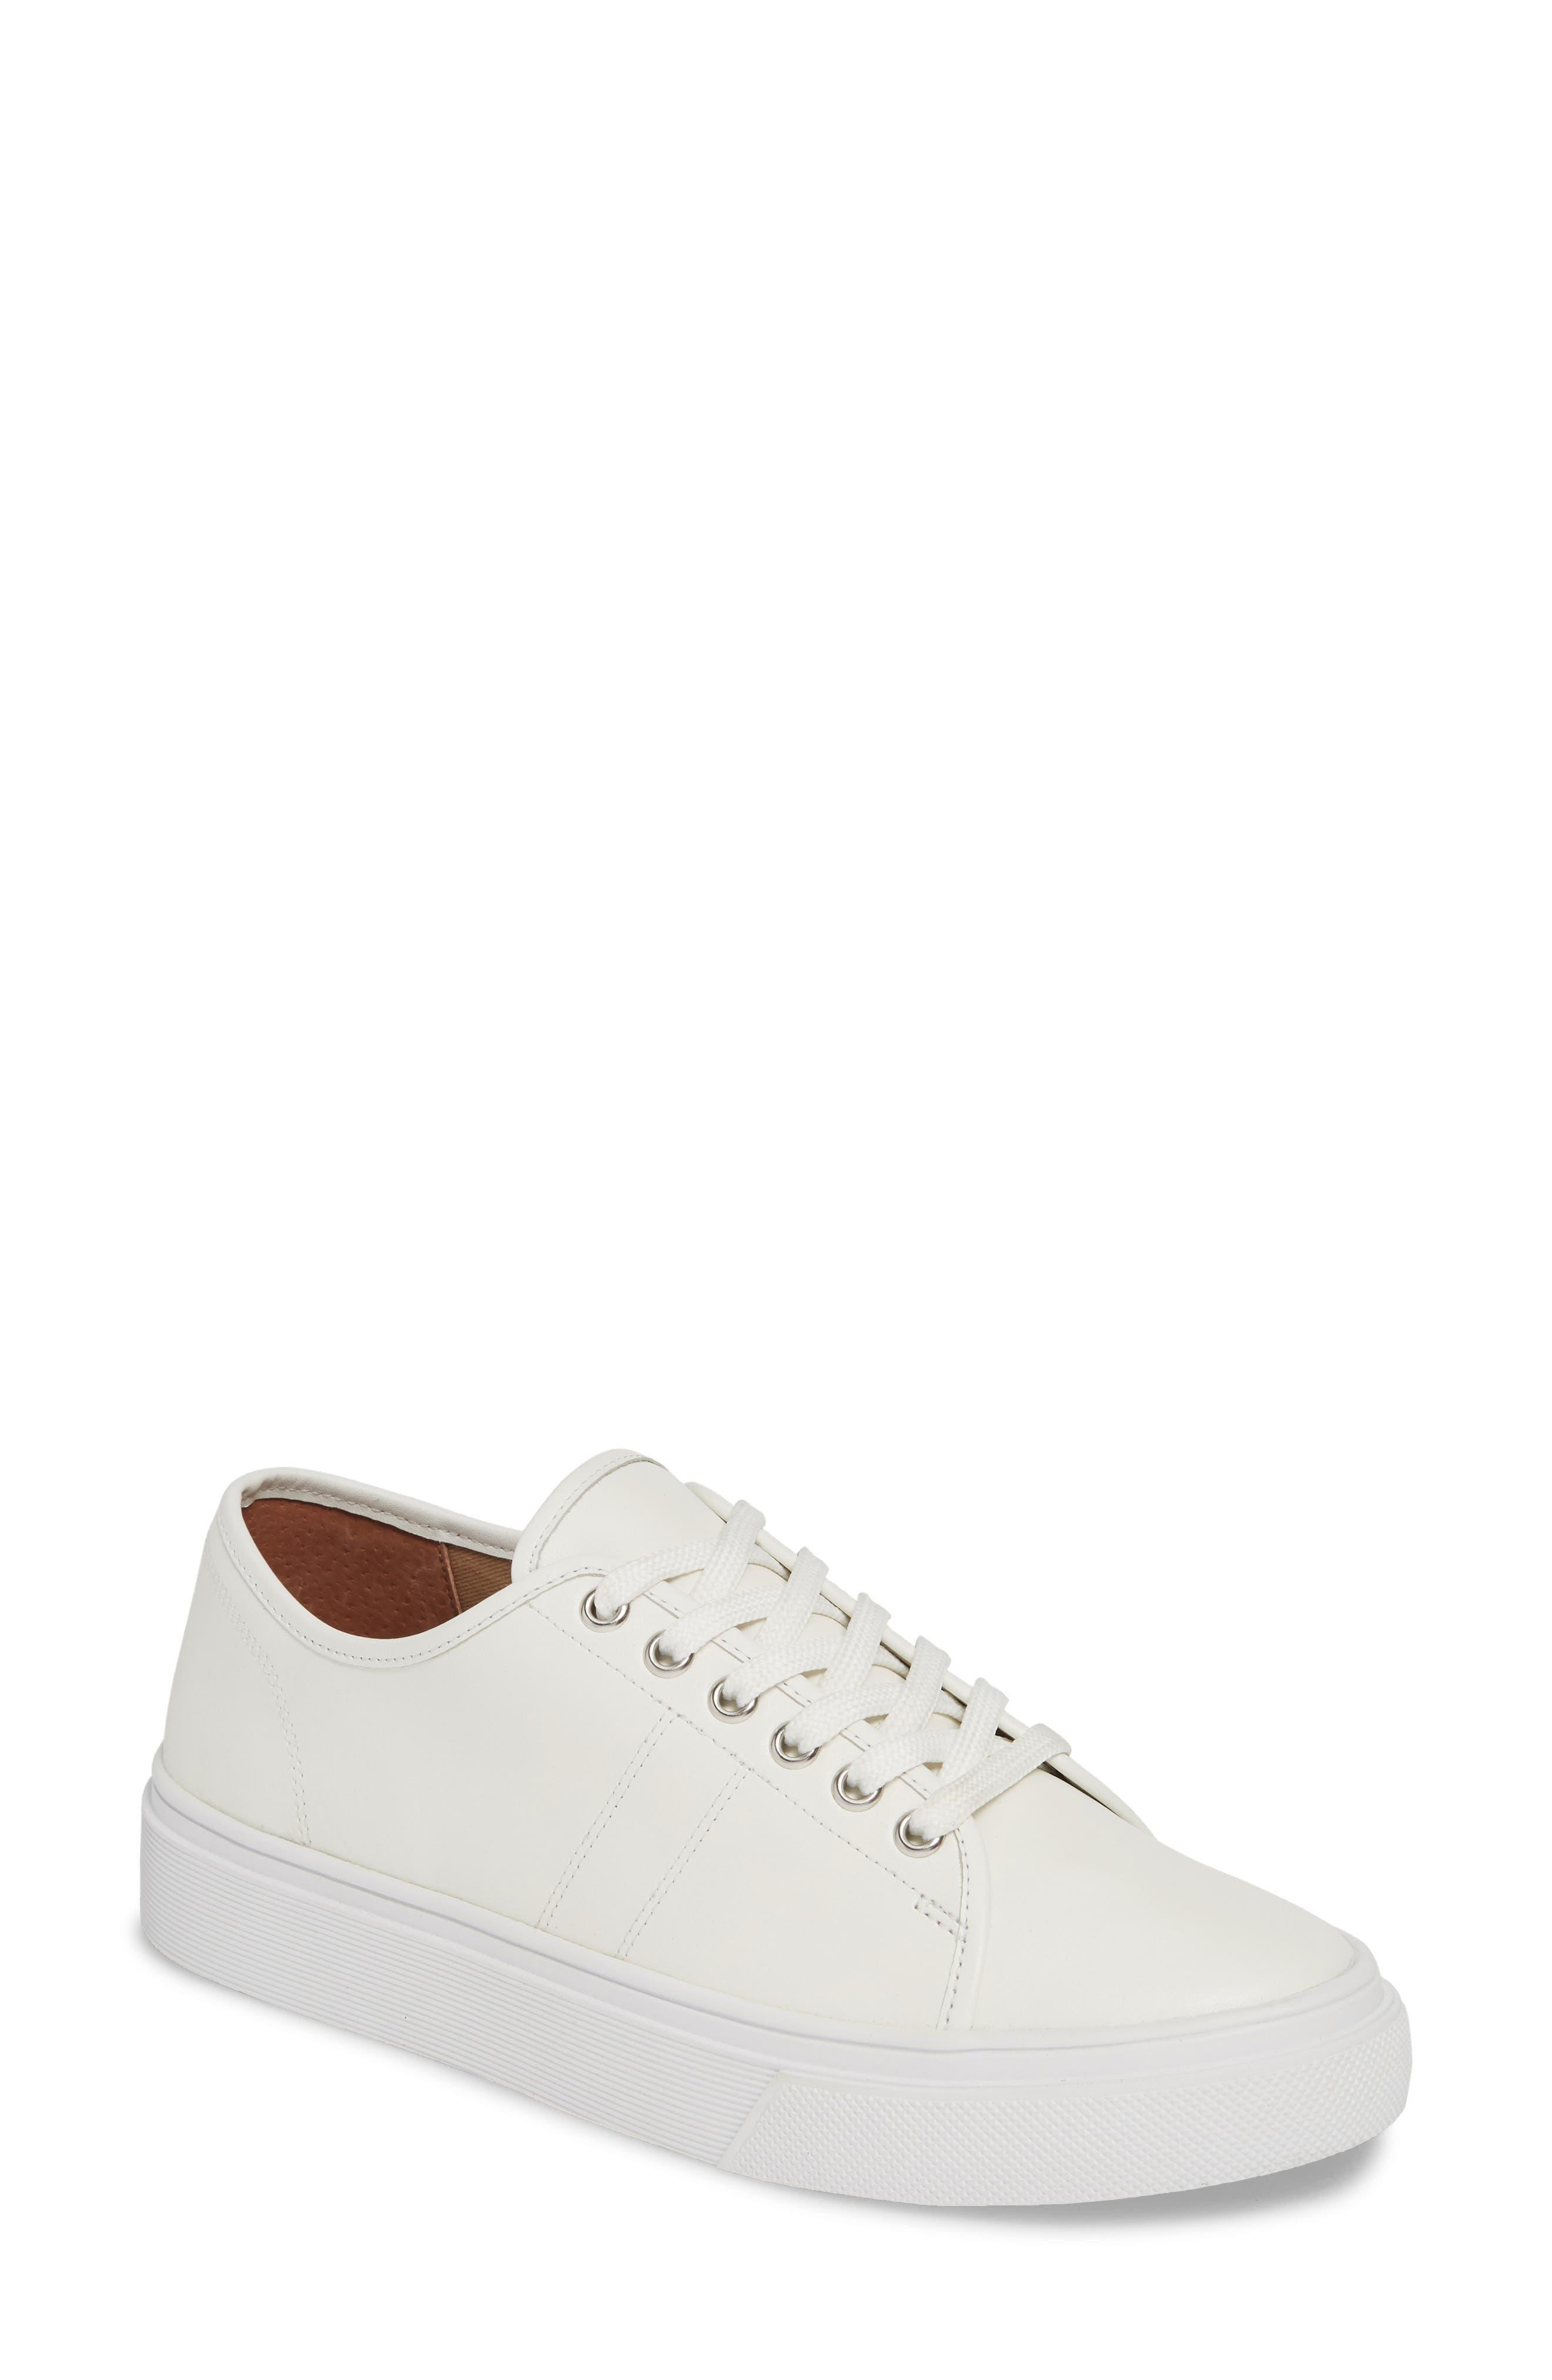 4a5aca7e7b4 Caslon® Style on a Shoestring  Shoe Steals